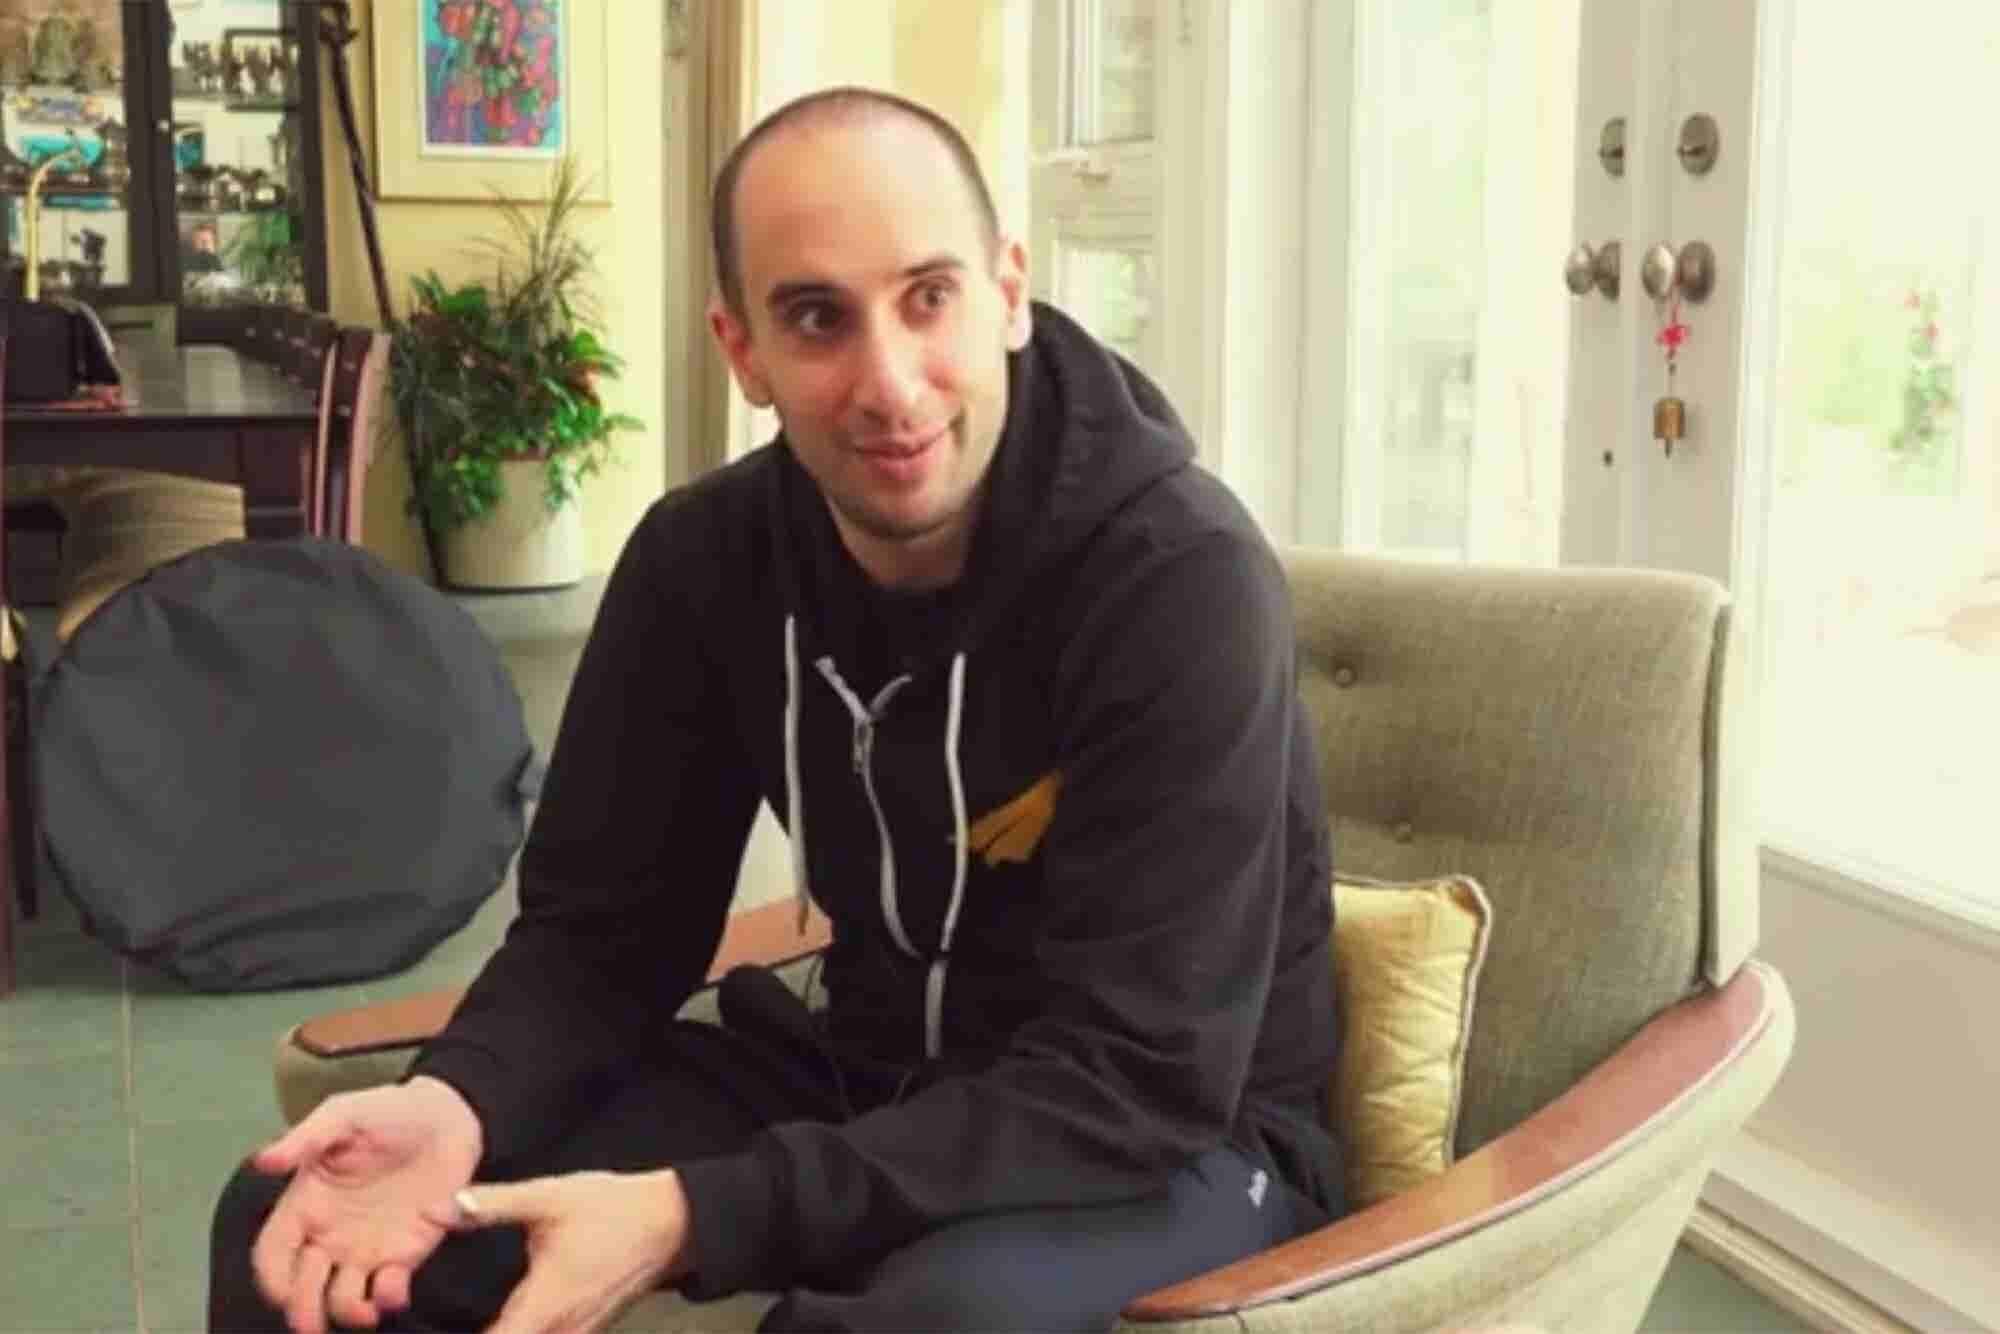 How to Avoid YouTube Pitfalls According to Evan Carmichael